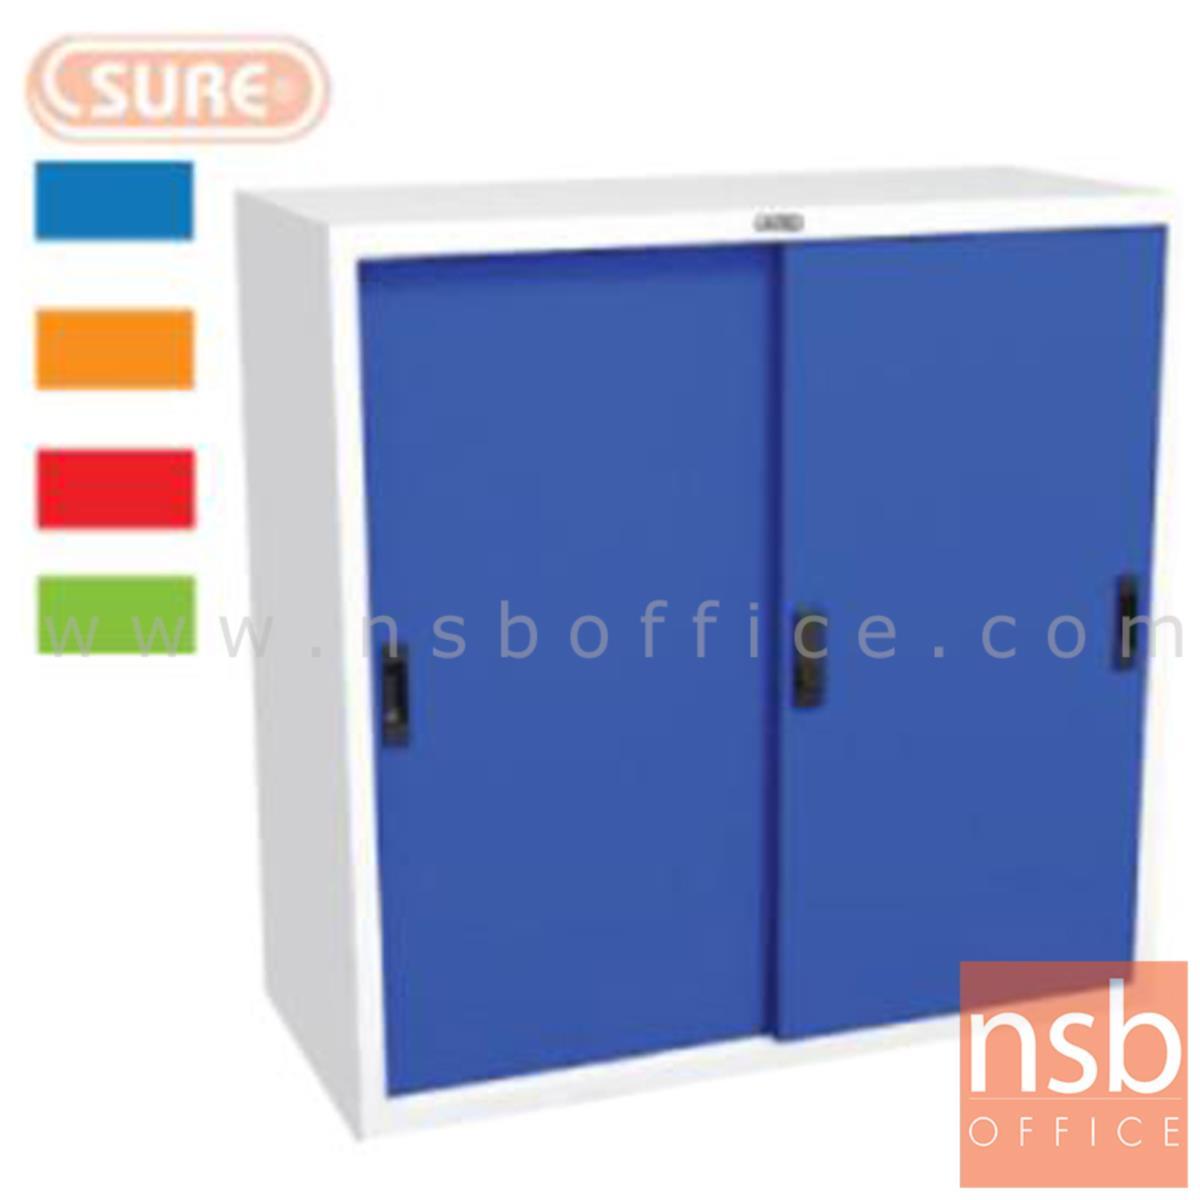 E04A038:ตู้เหล็ก 2 บานเลื่อนทึบเตี้ย หน้าบานสีสัน (3 และ 4 ฟุต) รุ่น CSL-03,CSL-04